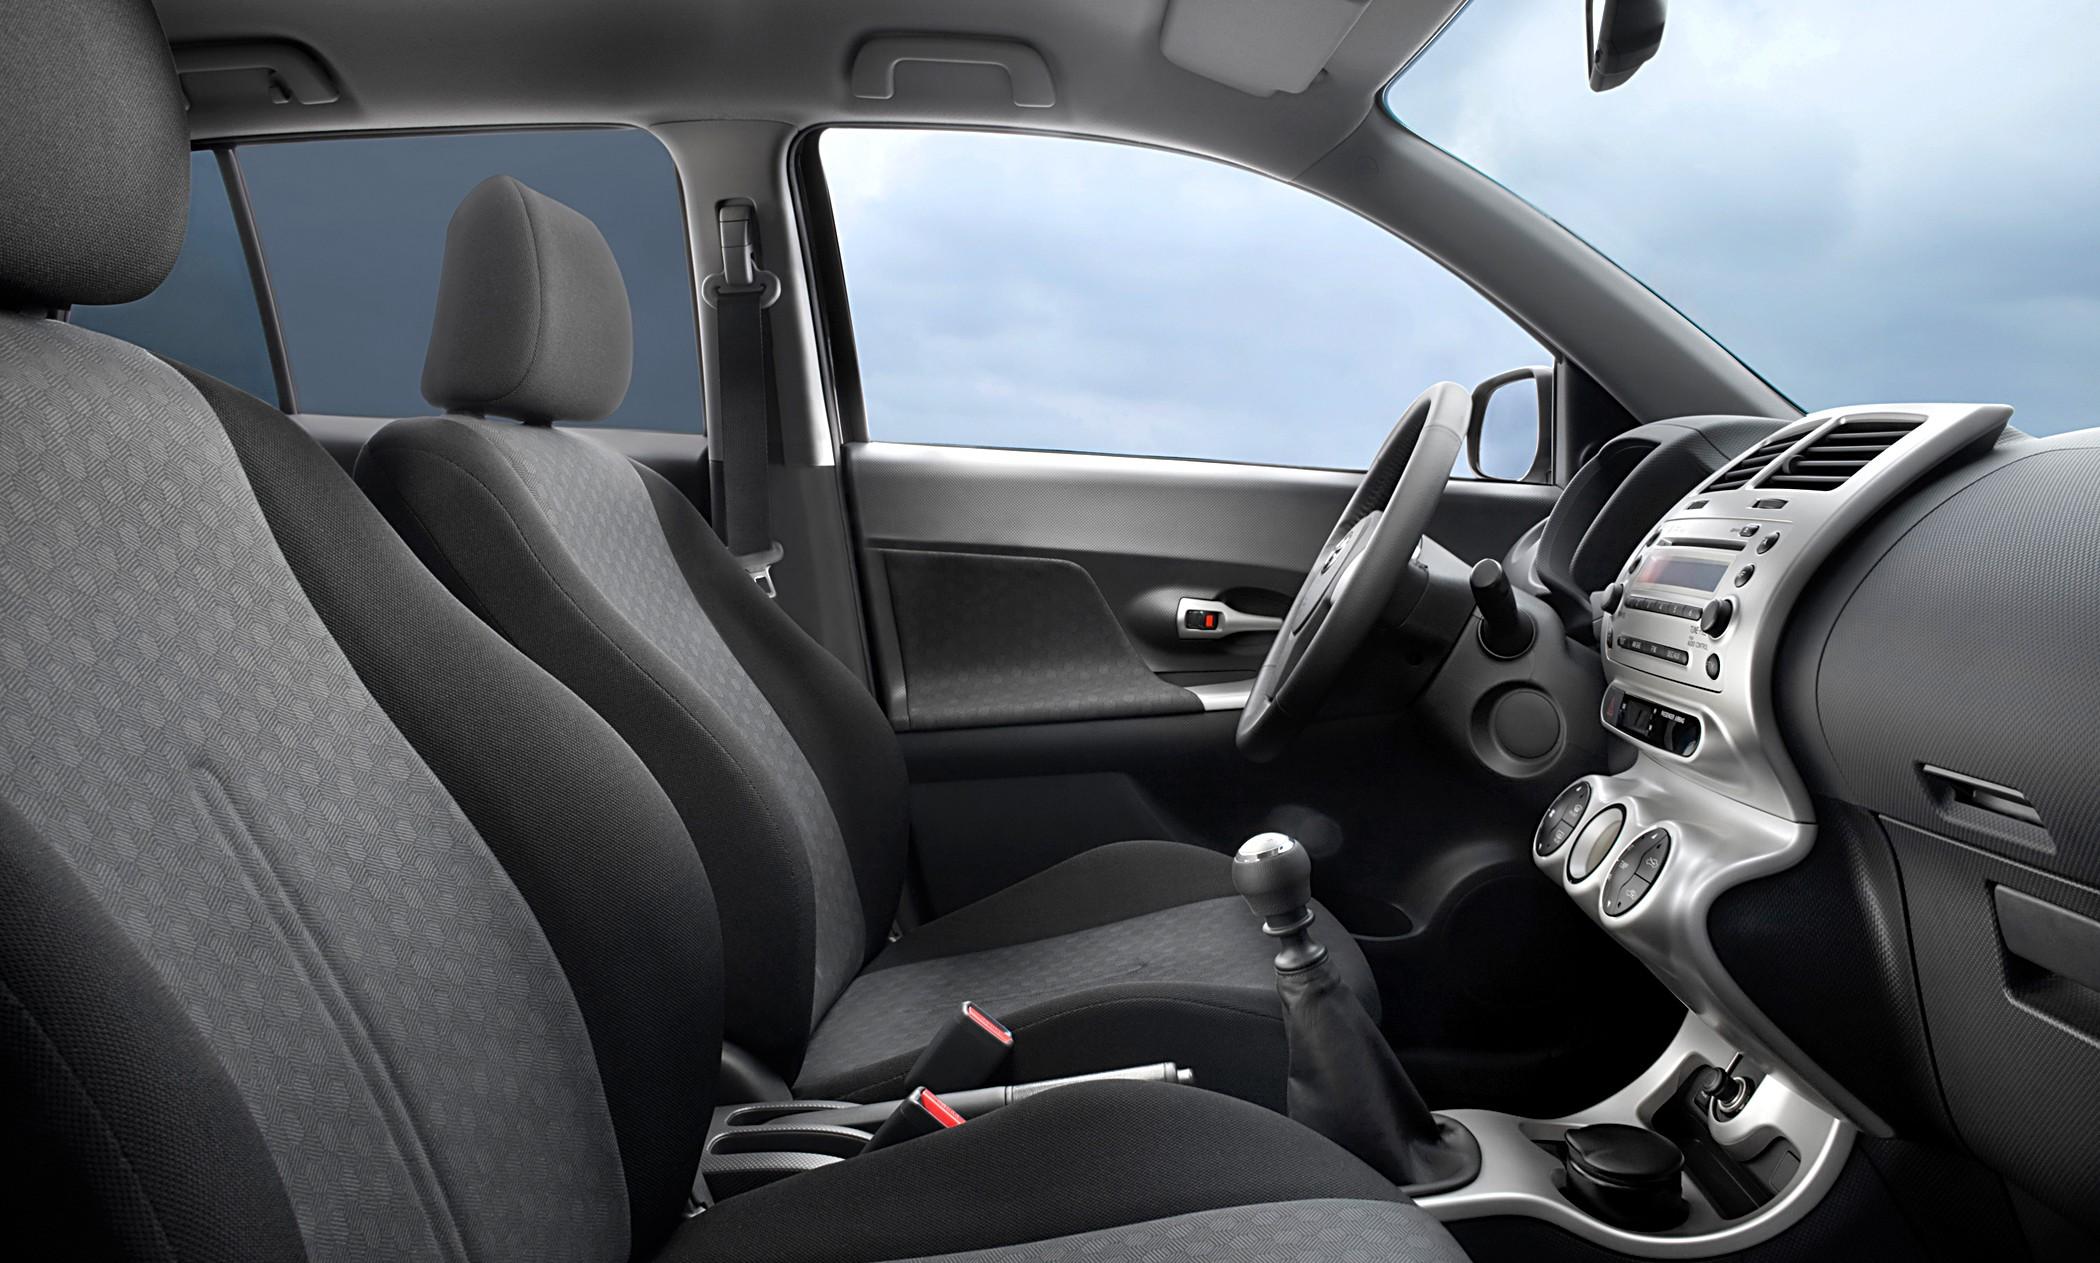 Toyota Urban Cruiser 2013: ideal para romper con la rutina